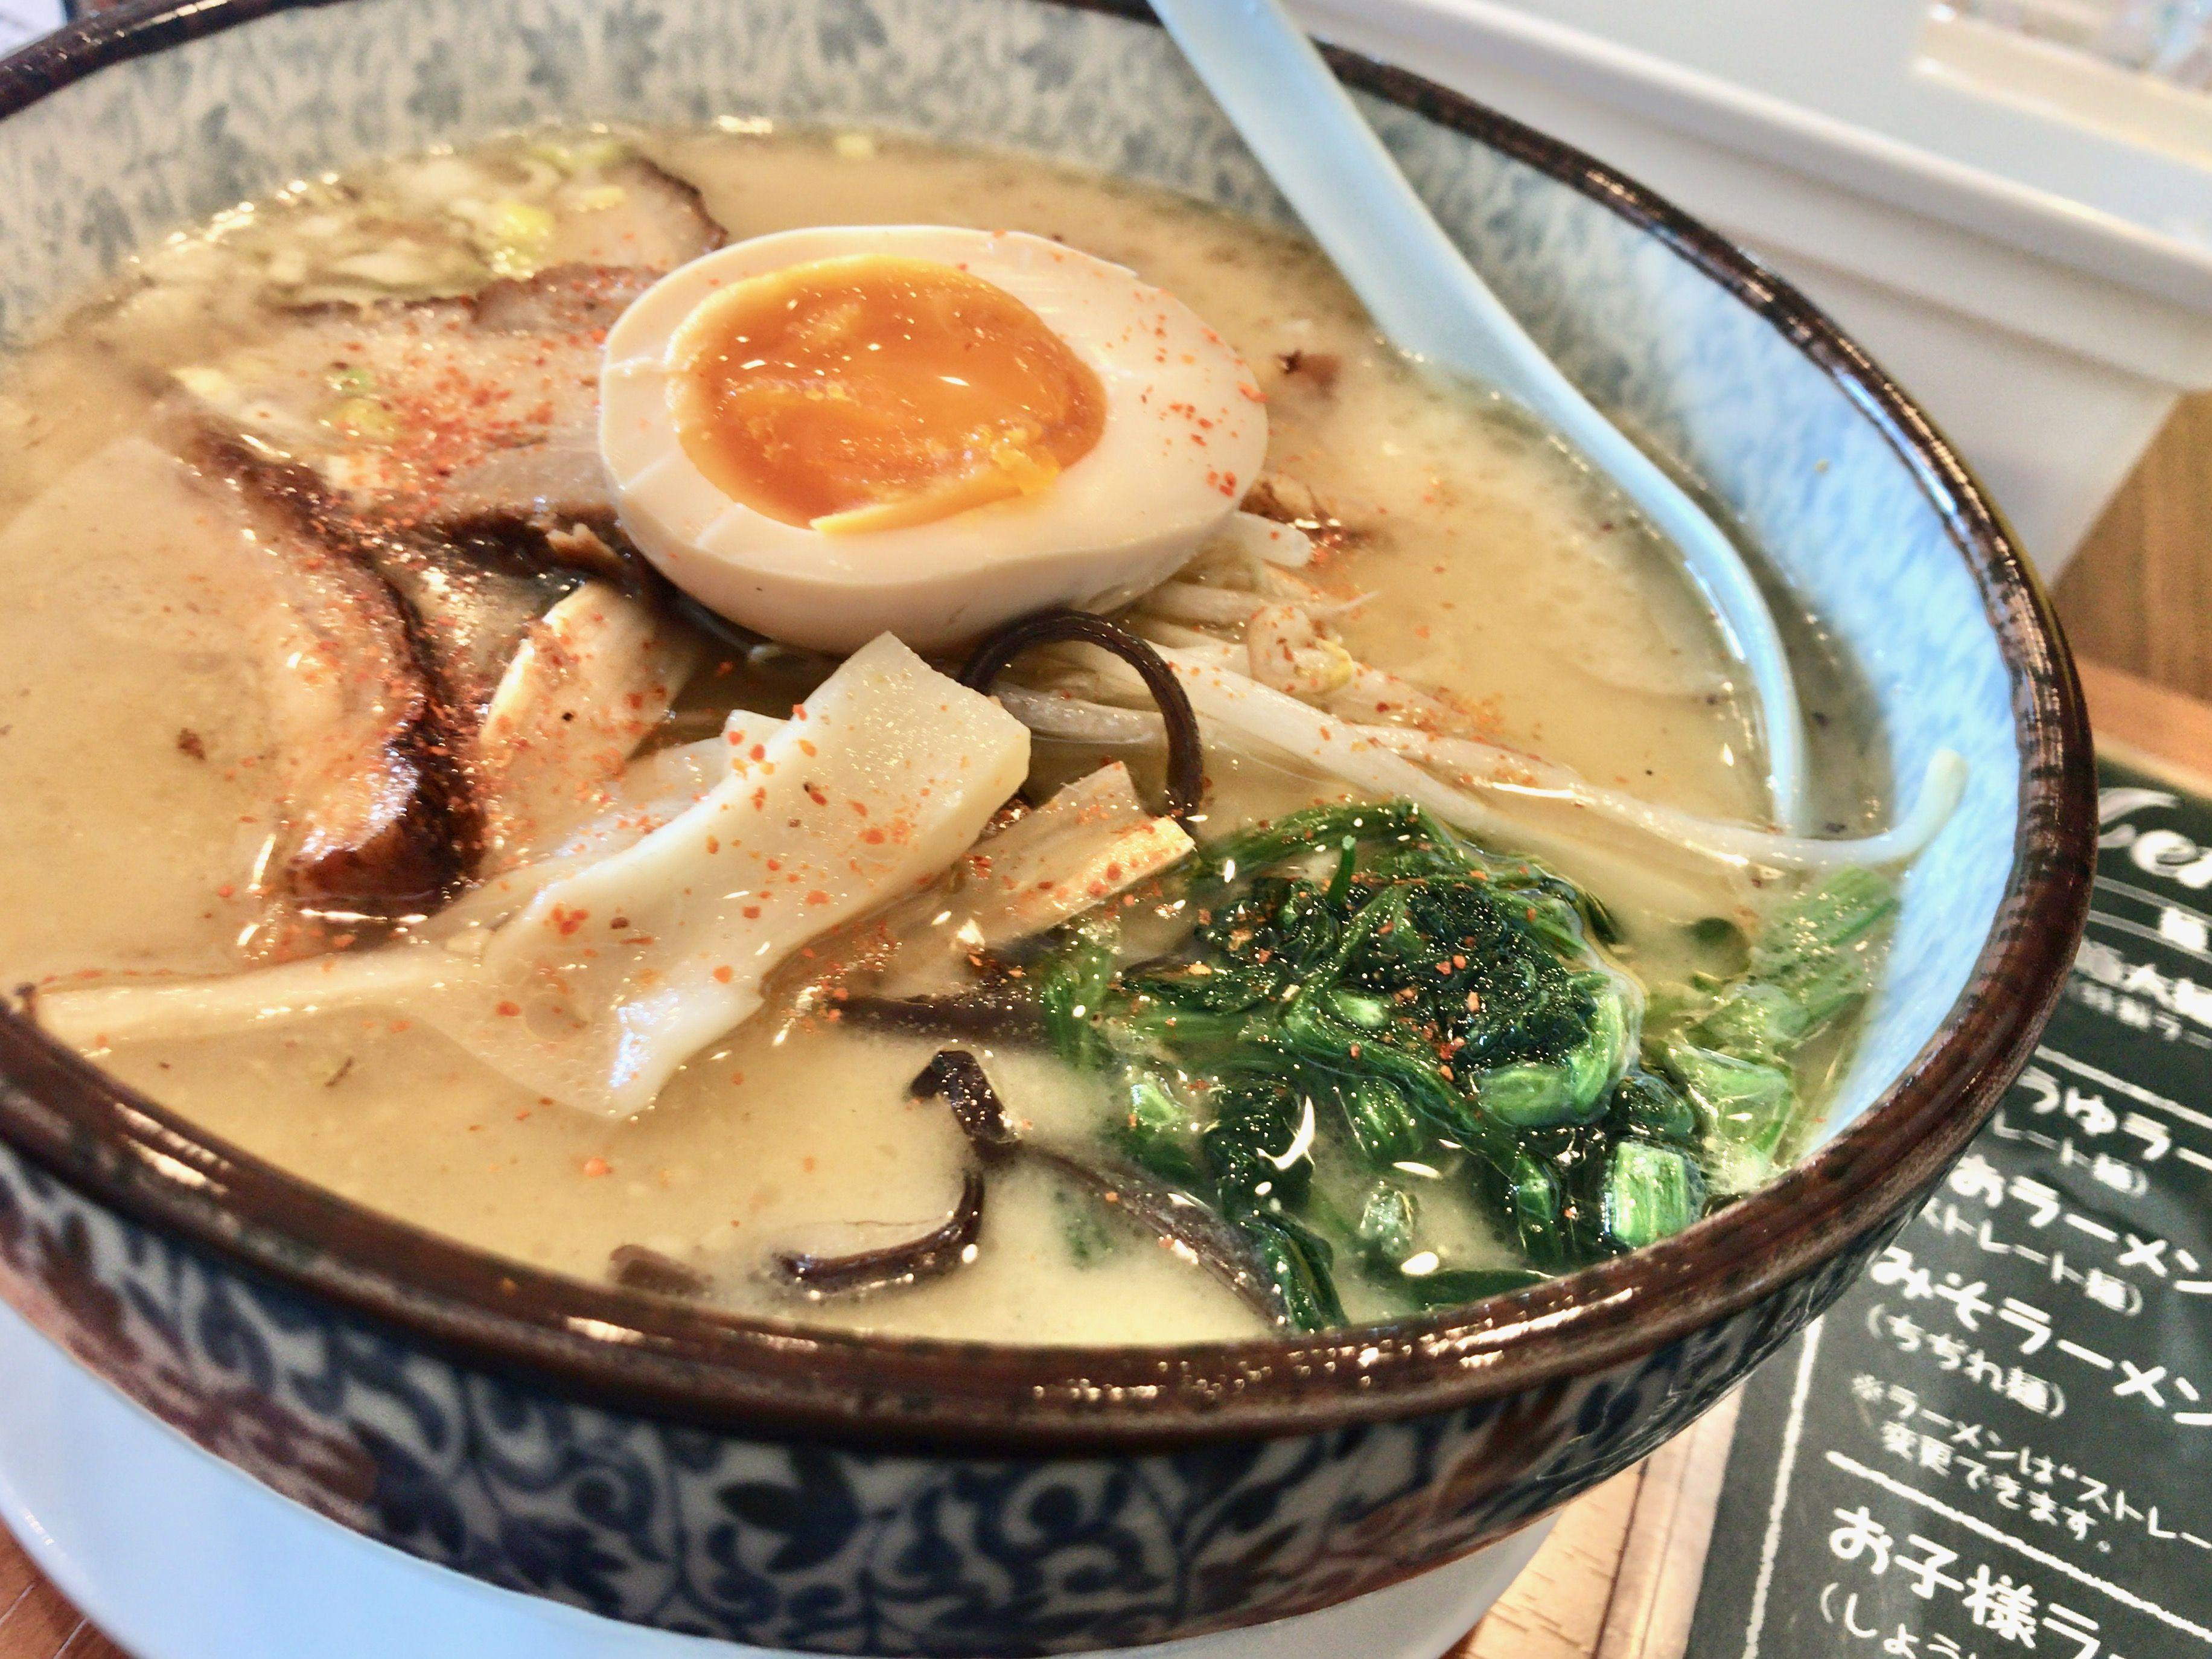 #Ramen #Miso_Flavor #Flavorful #Noodles #MARUTAKE #Sapporo #Japan #ラーメン #みそラーメン #チャーシュー増し #白味噌の優しい味 #札幌 #マルタケ #된장맛 #라면 #Nudler #Makaron  #Nudeln# #Noedel  😸